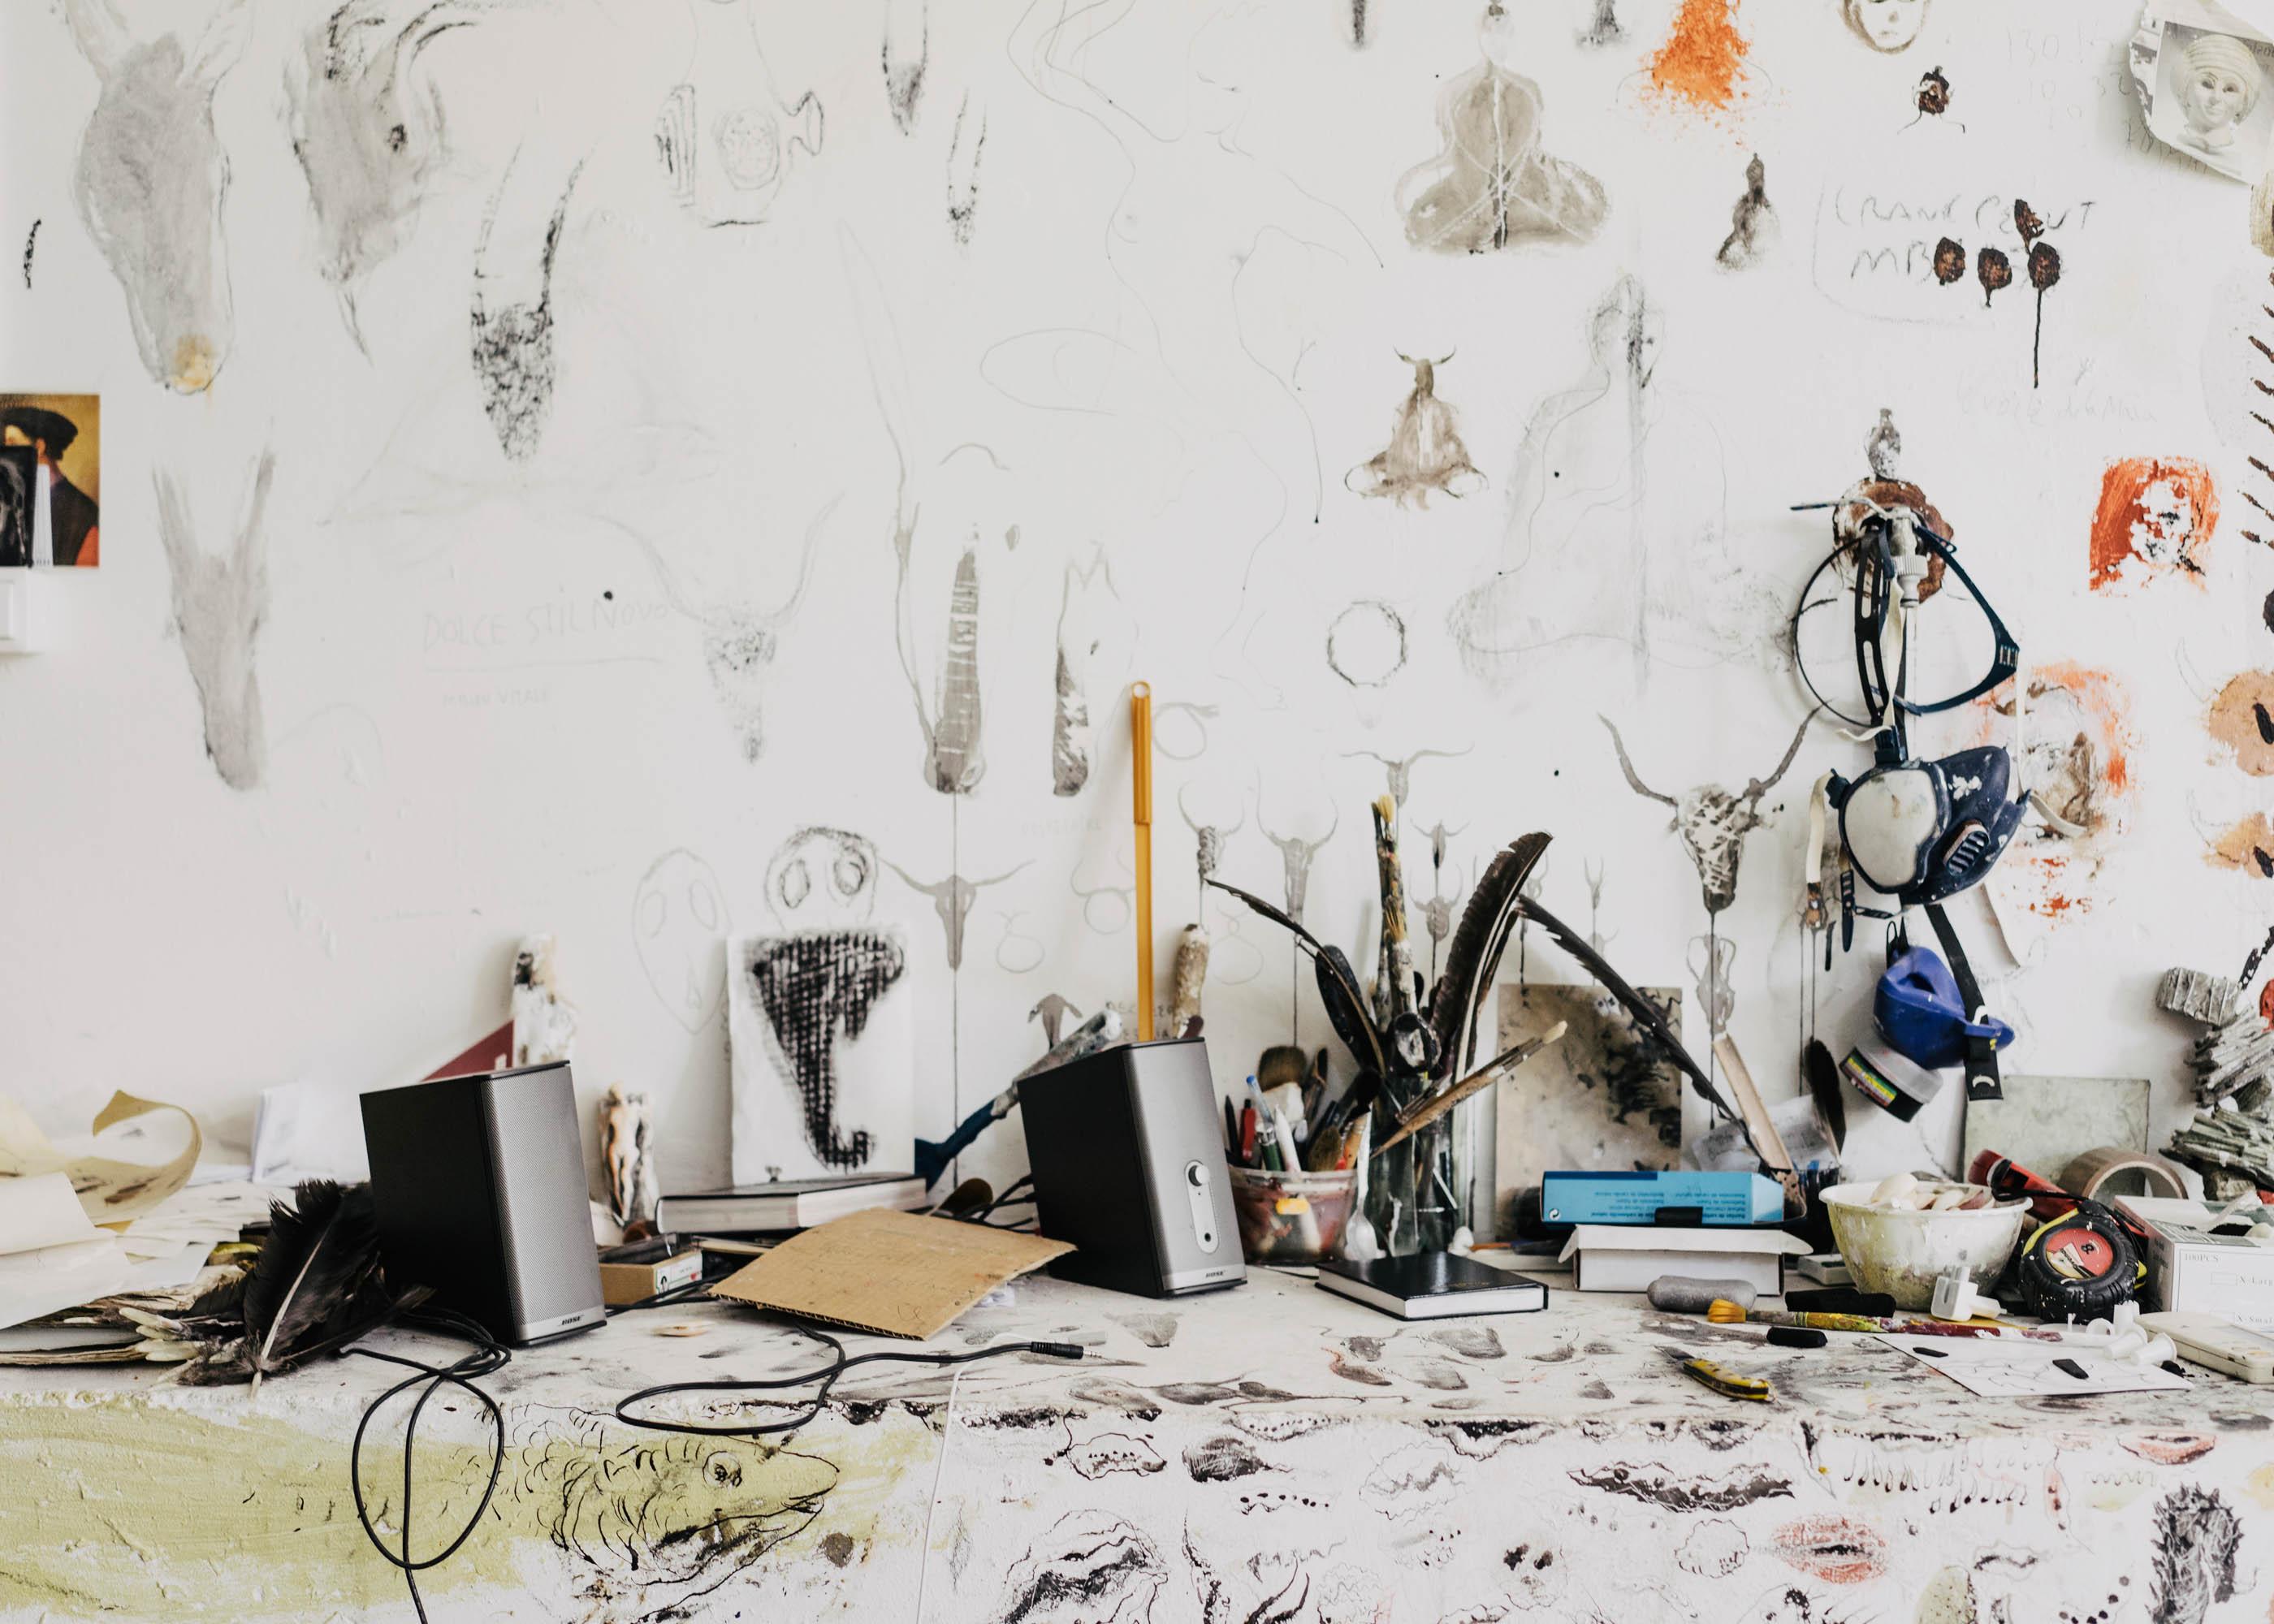 #miquelbarcelo #artist #house #mallorca #editorial #wsj #wallstreetjournal #studio